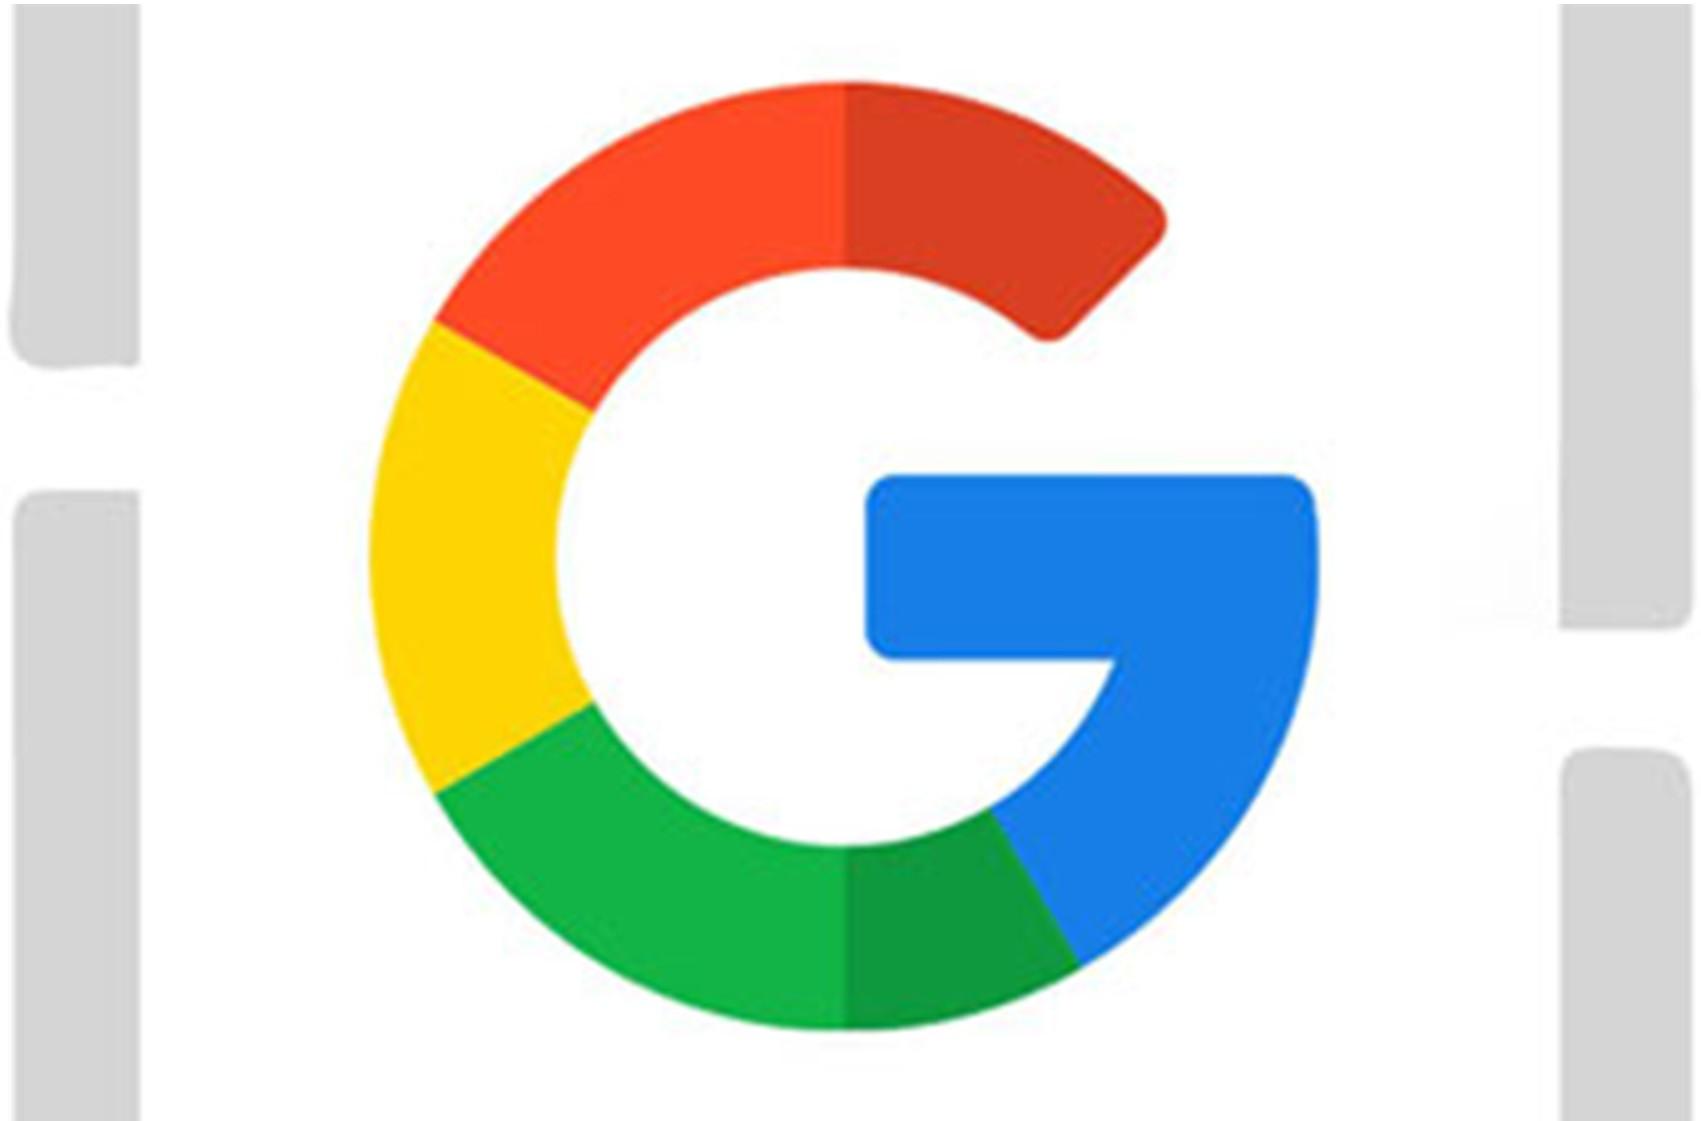 داستان لوگوی google